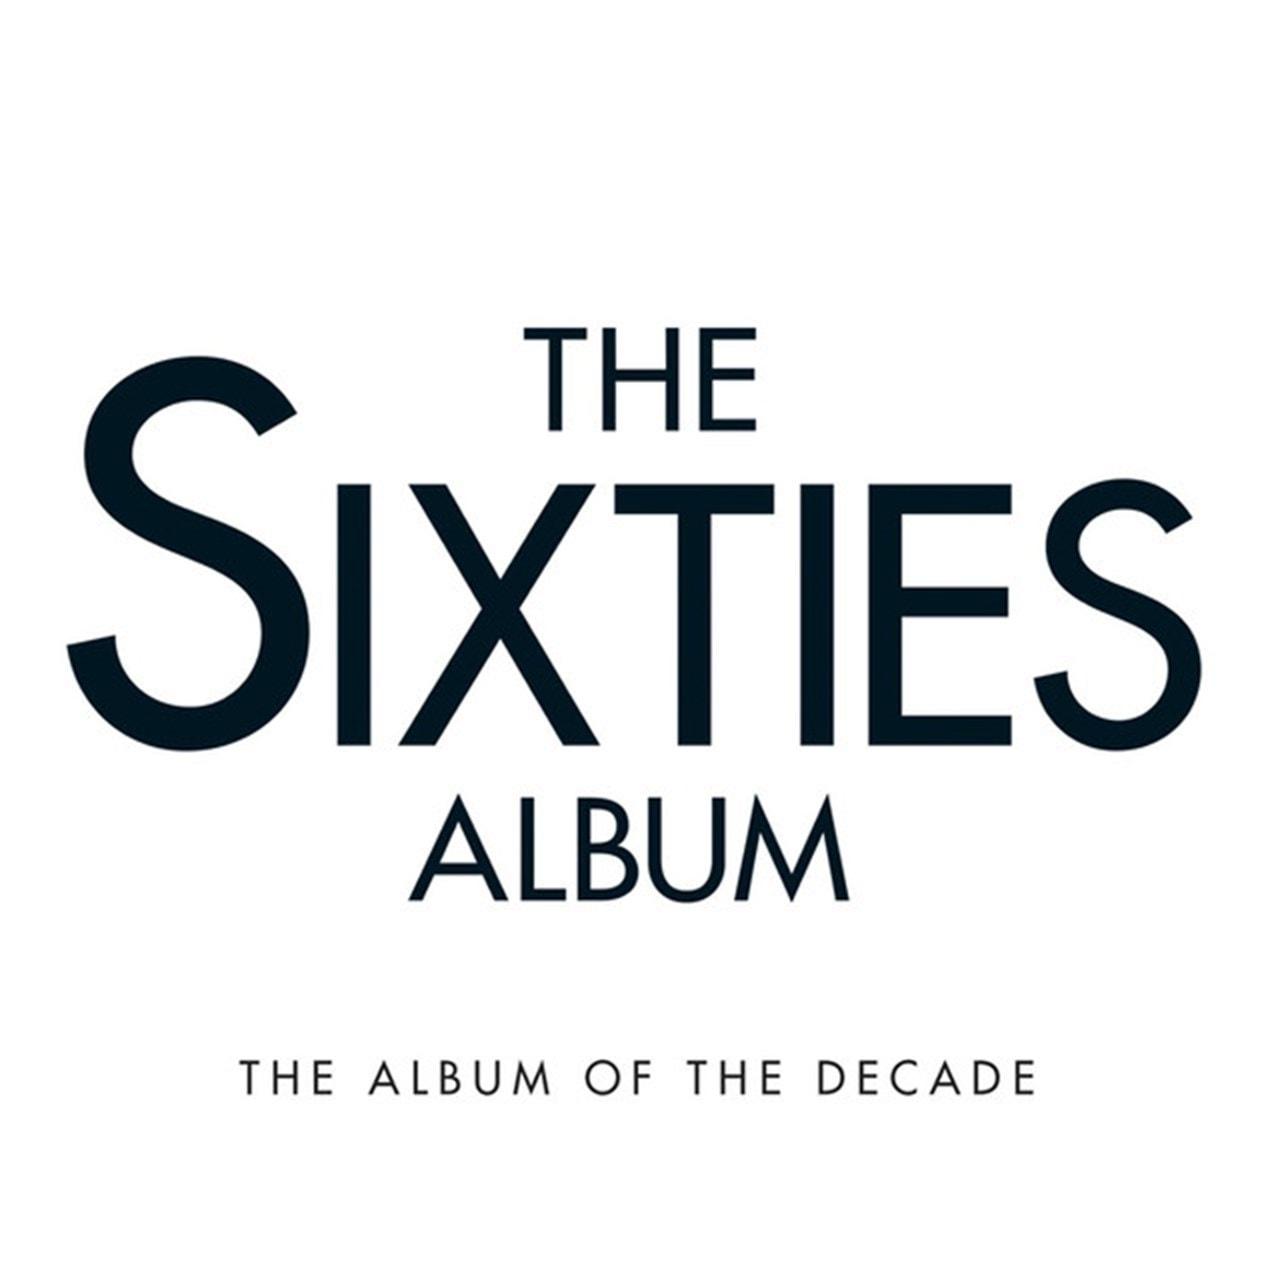 The Sixties Album: The Album of the Decade - 1